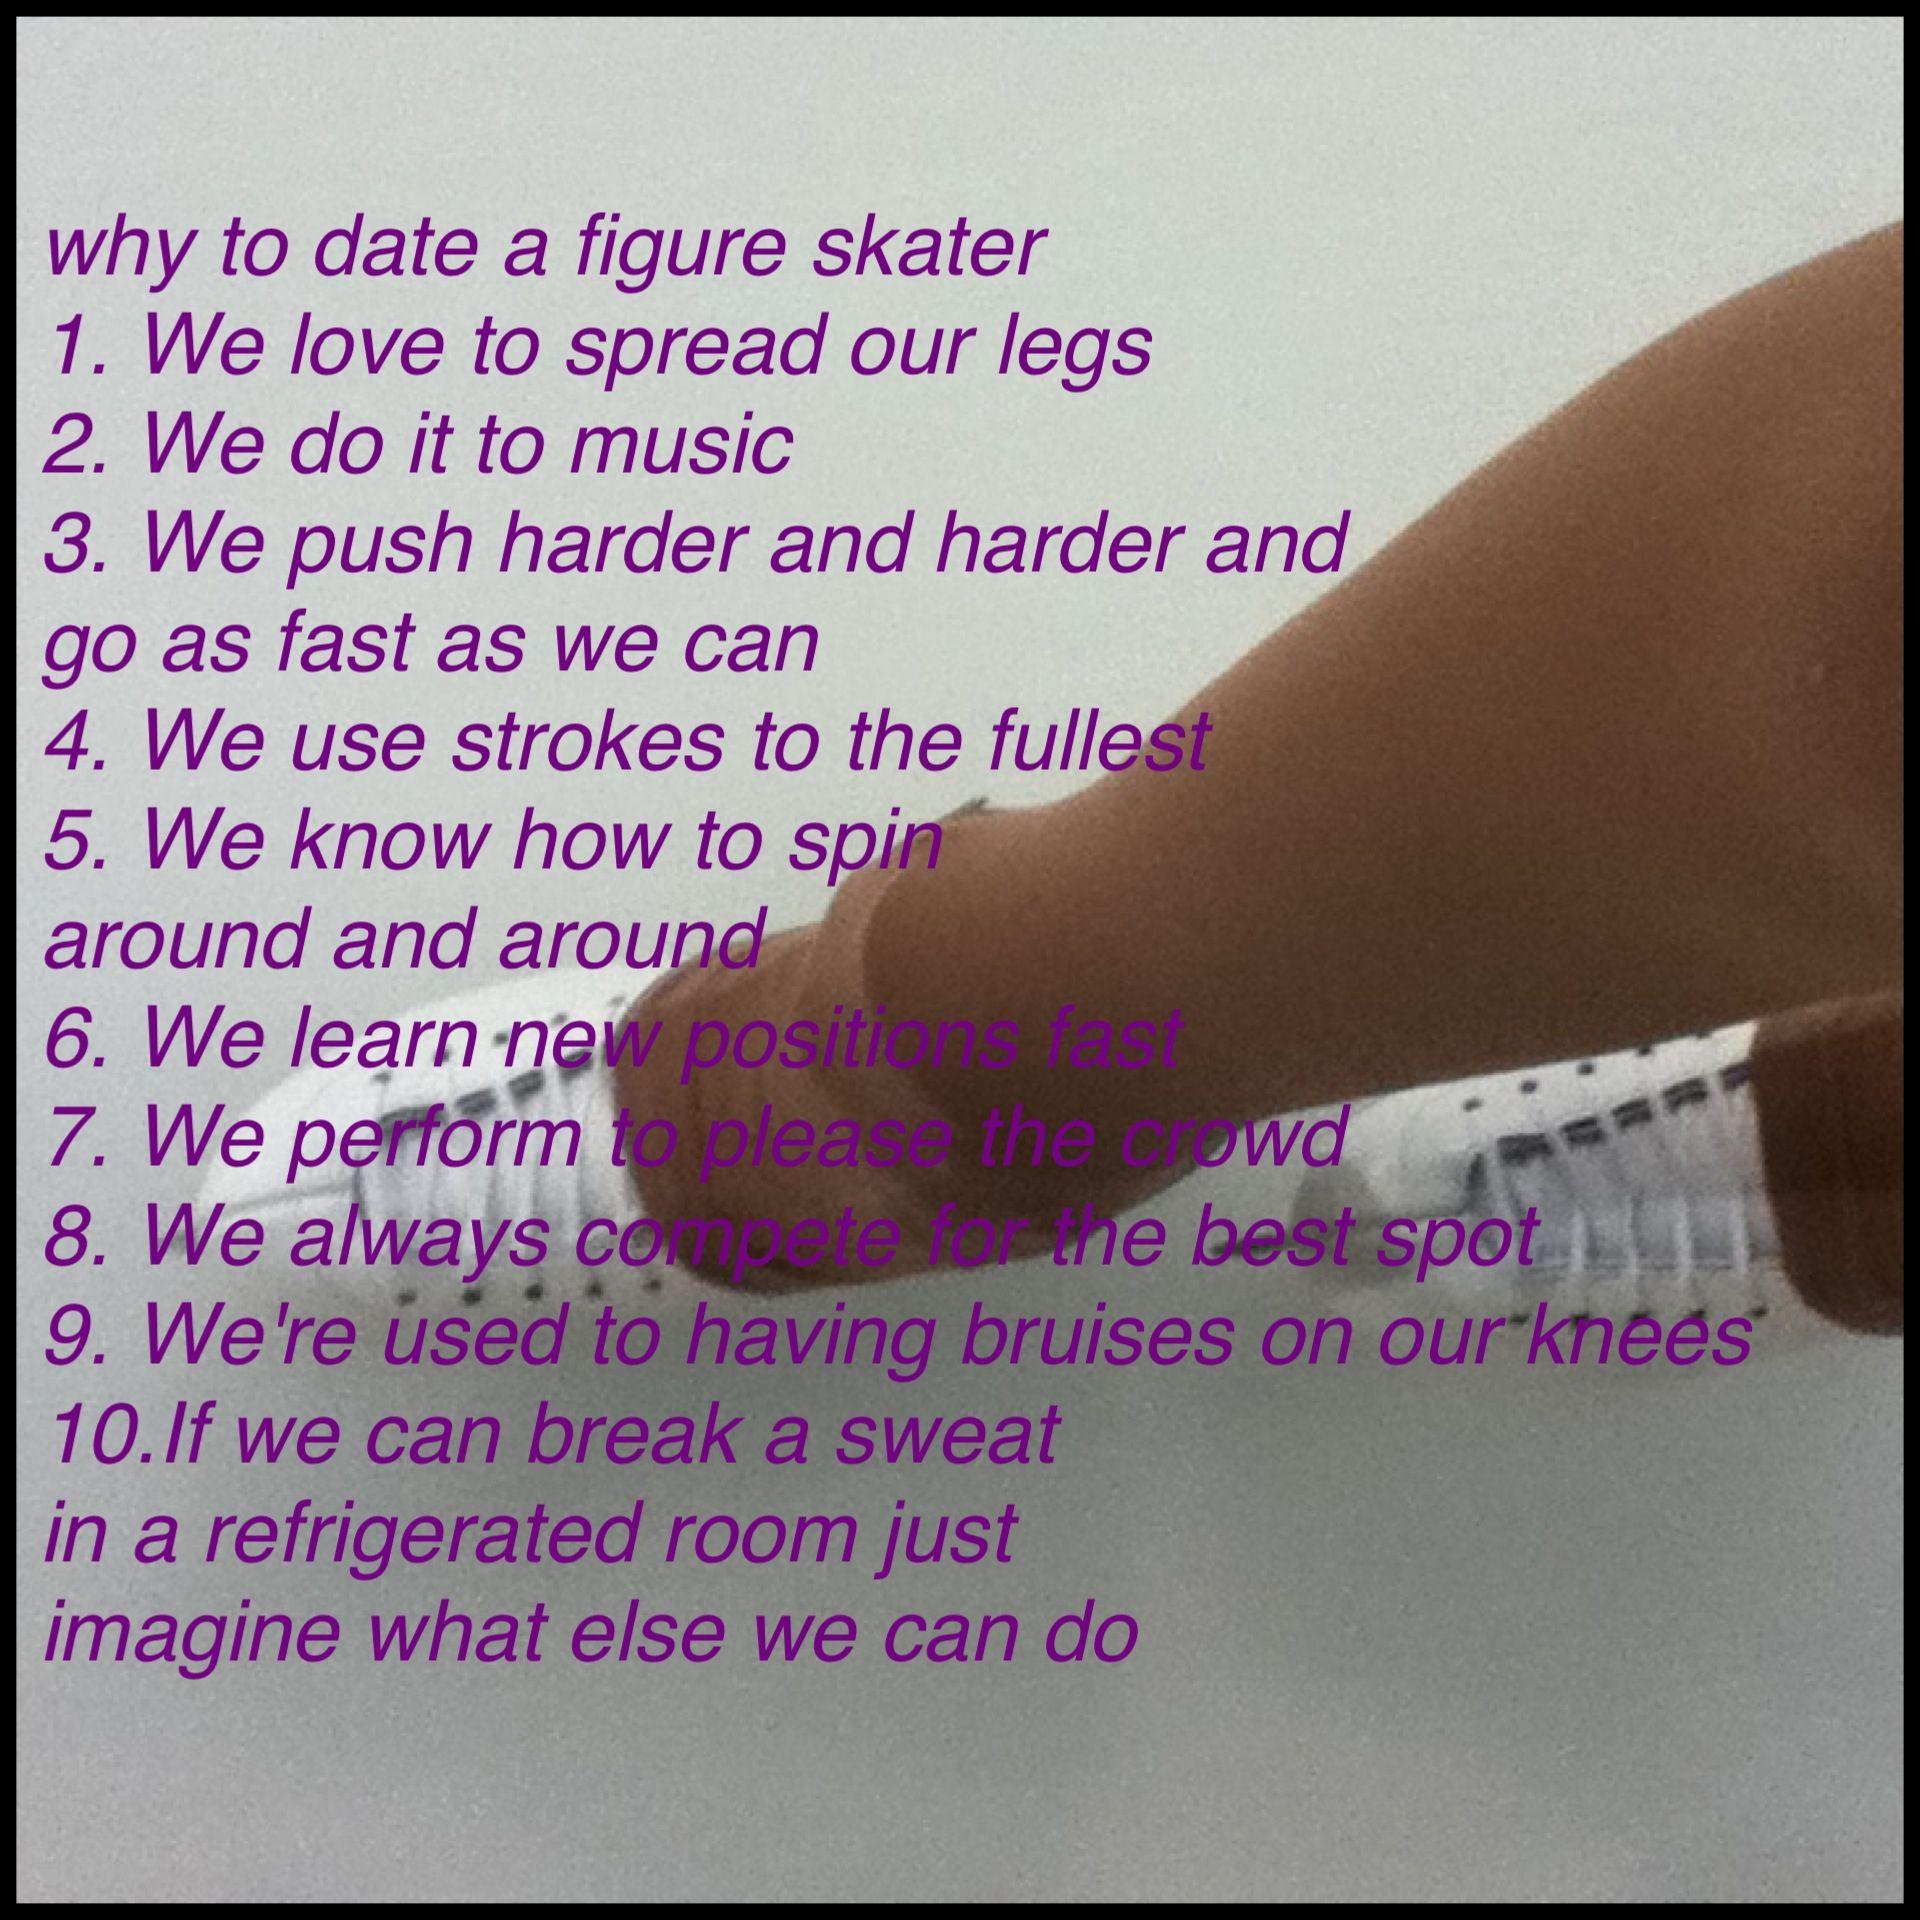 dating figura skaters)